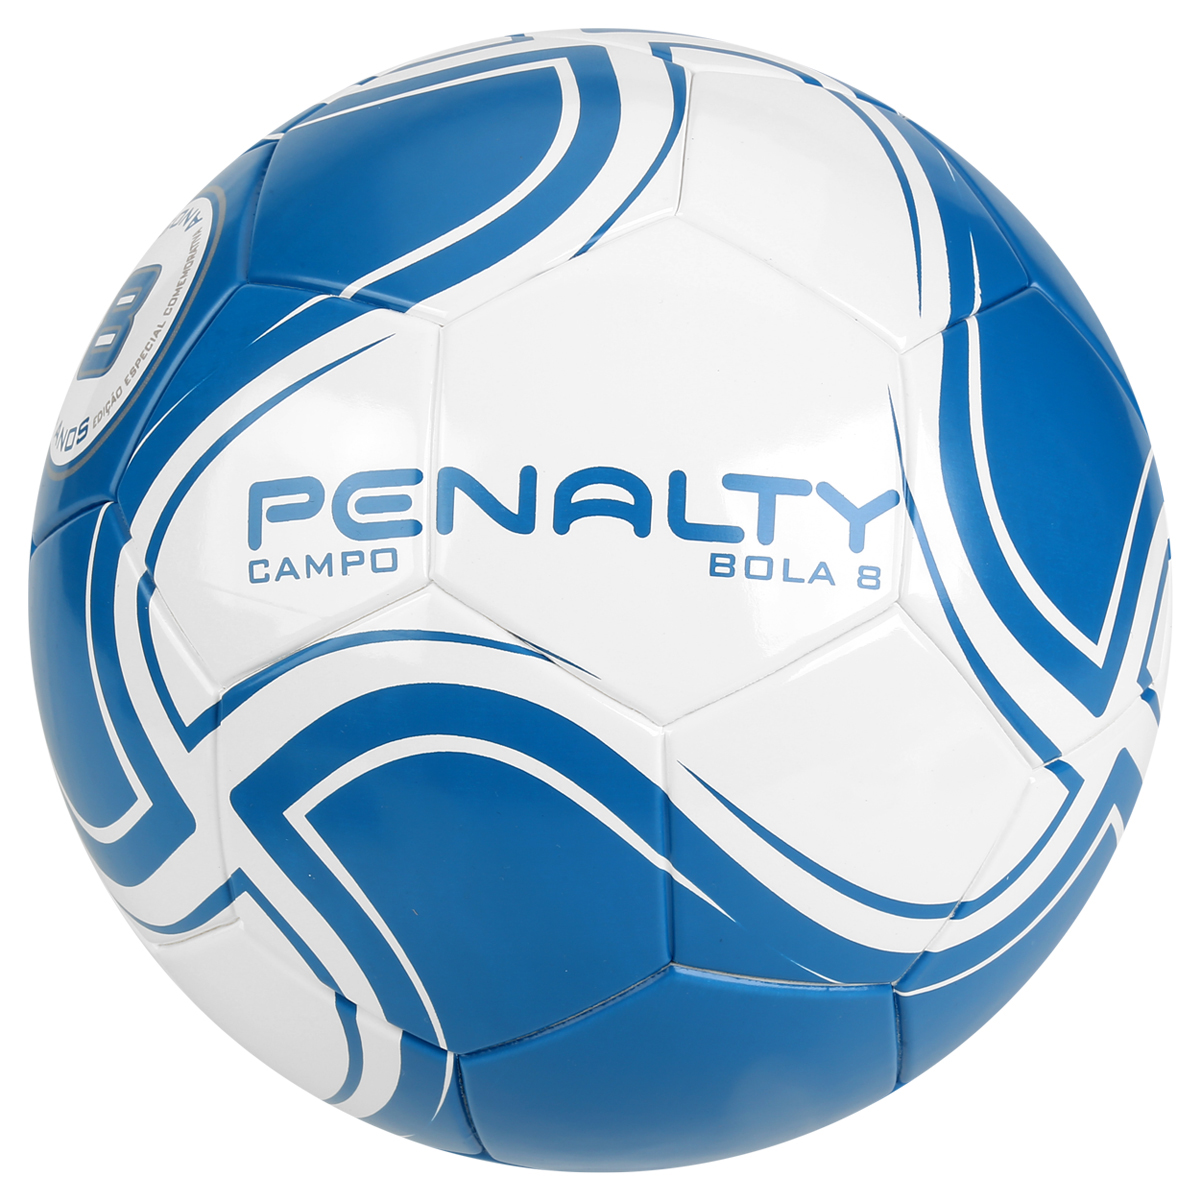 Bola Penalty 8 Campo S11 R3 Ultra Fusion Vi 8b937fe583c6b